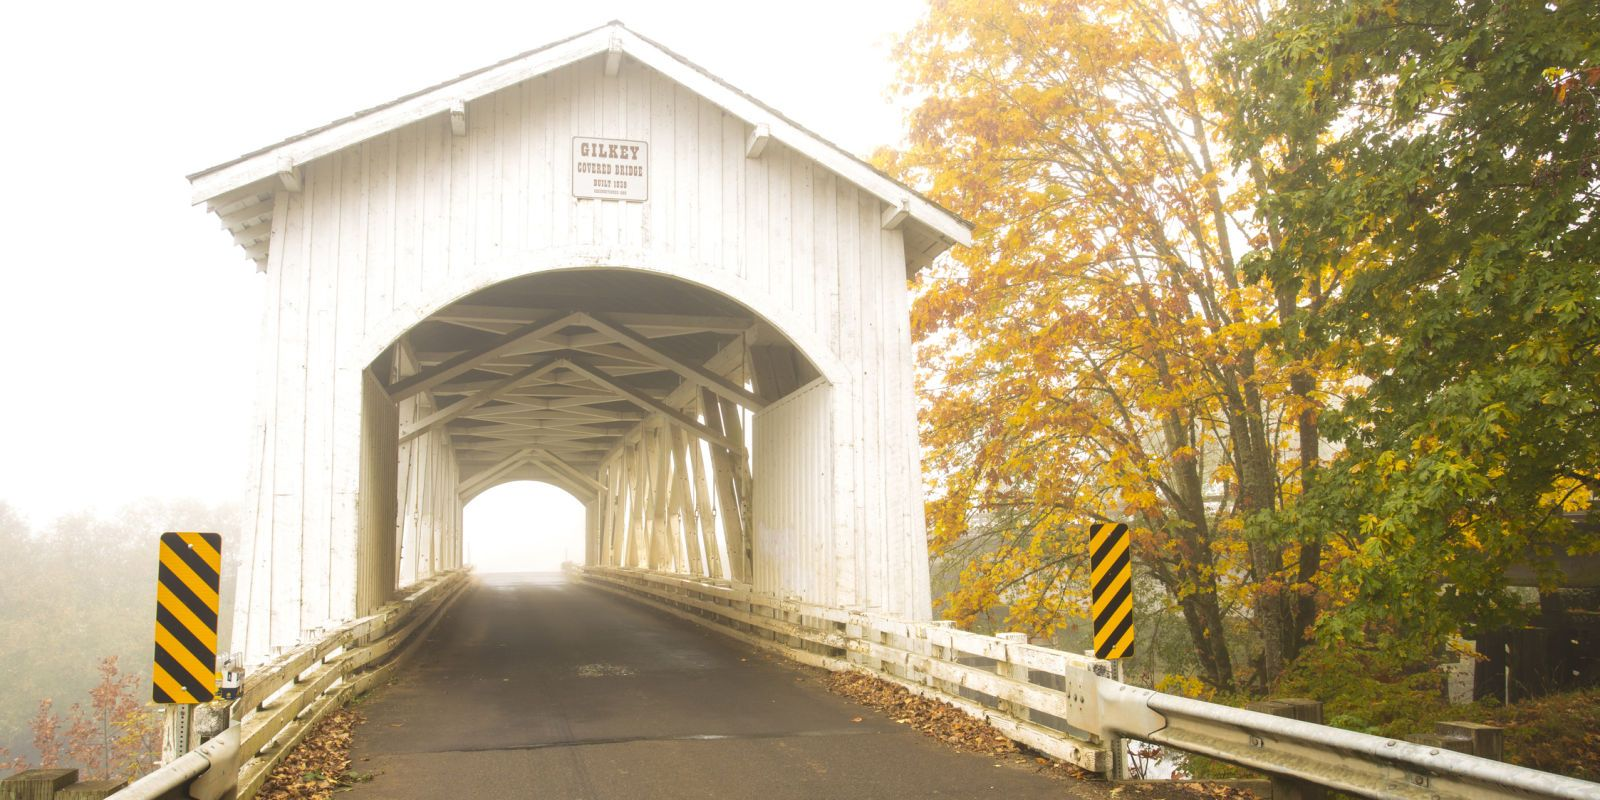 Oregons Covered Bridges (Images of America)